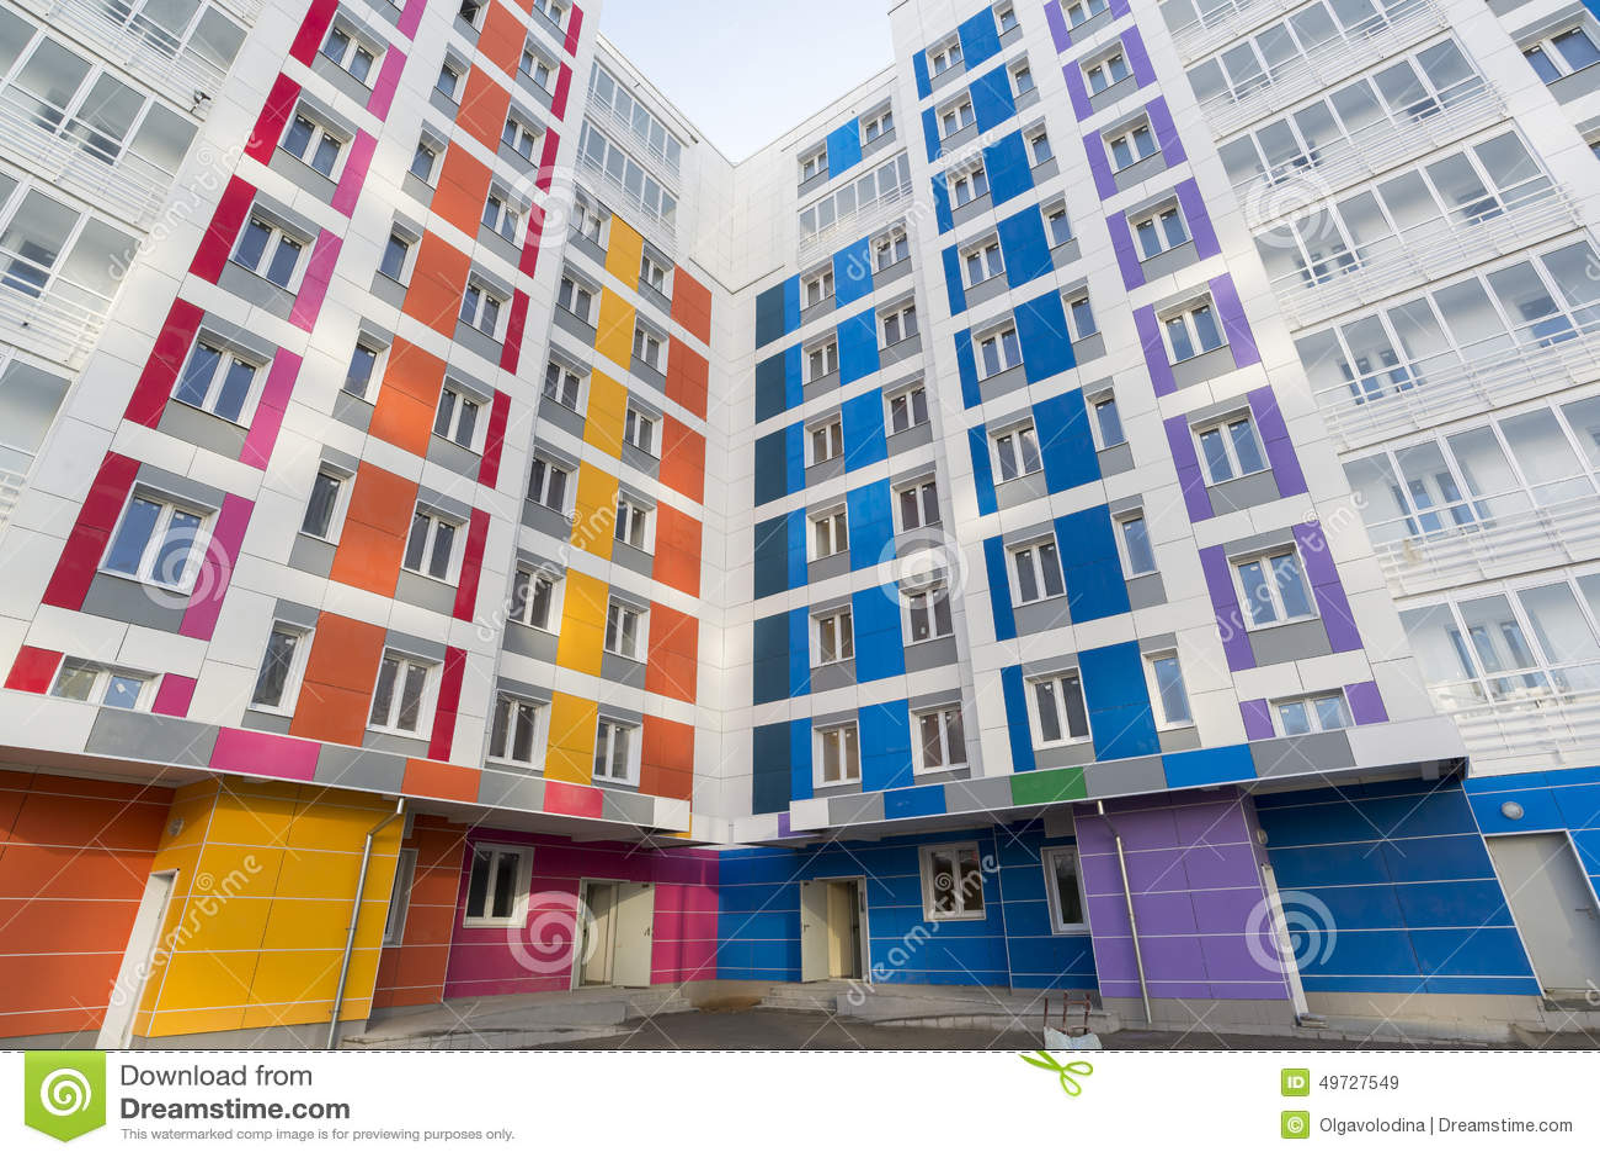 Mooi modern huis met kleurrijke voorgevels stock foto afbeelding 49727549 - Foto modern huis ...